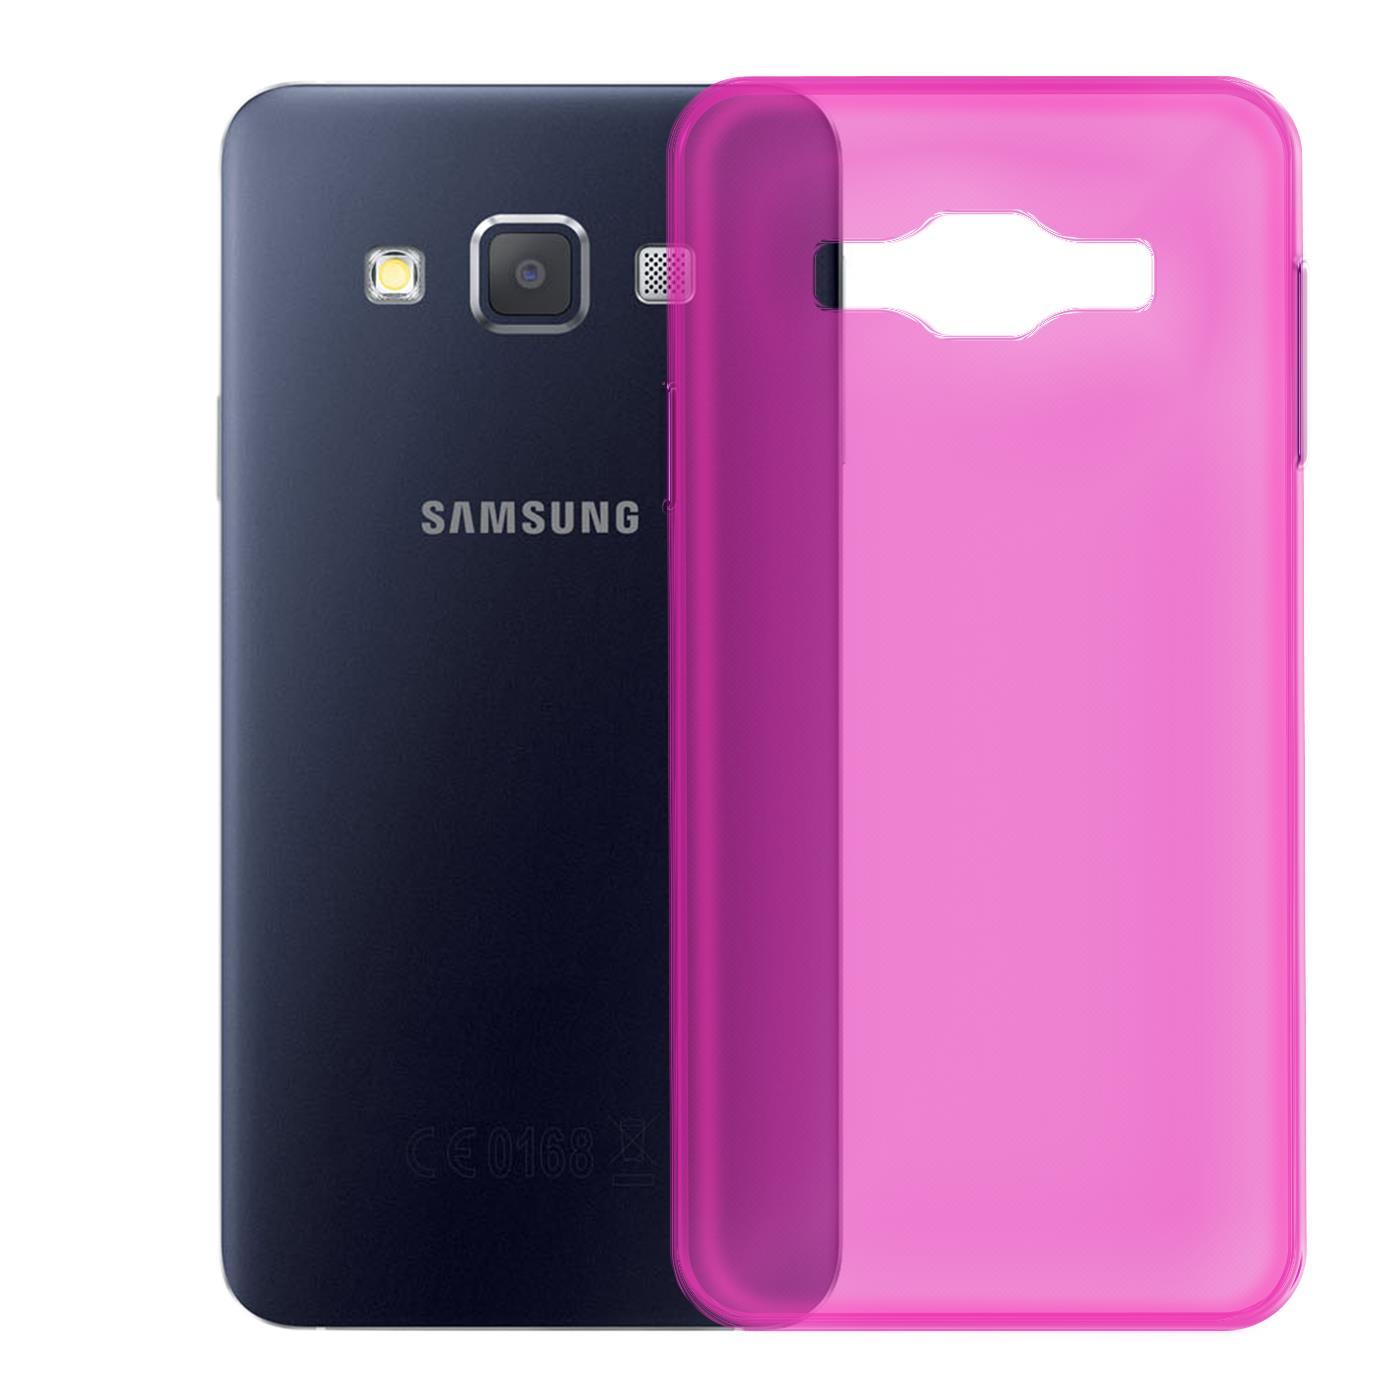 Samsung-Galaxy-A3-2015-Thin-Silicone-Clear-Case-Cover-Ultra-Slim-Shockproof-Gel Indexbild 22